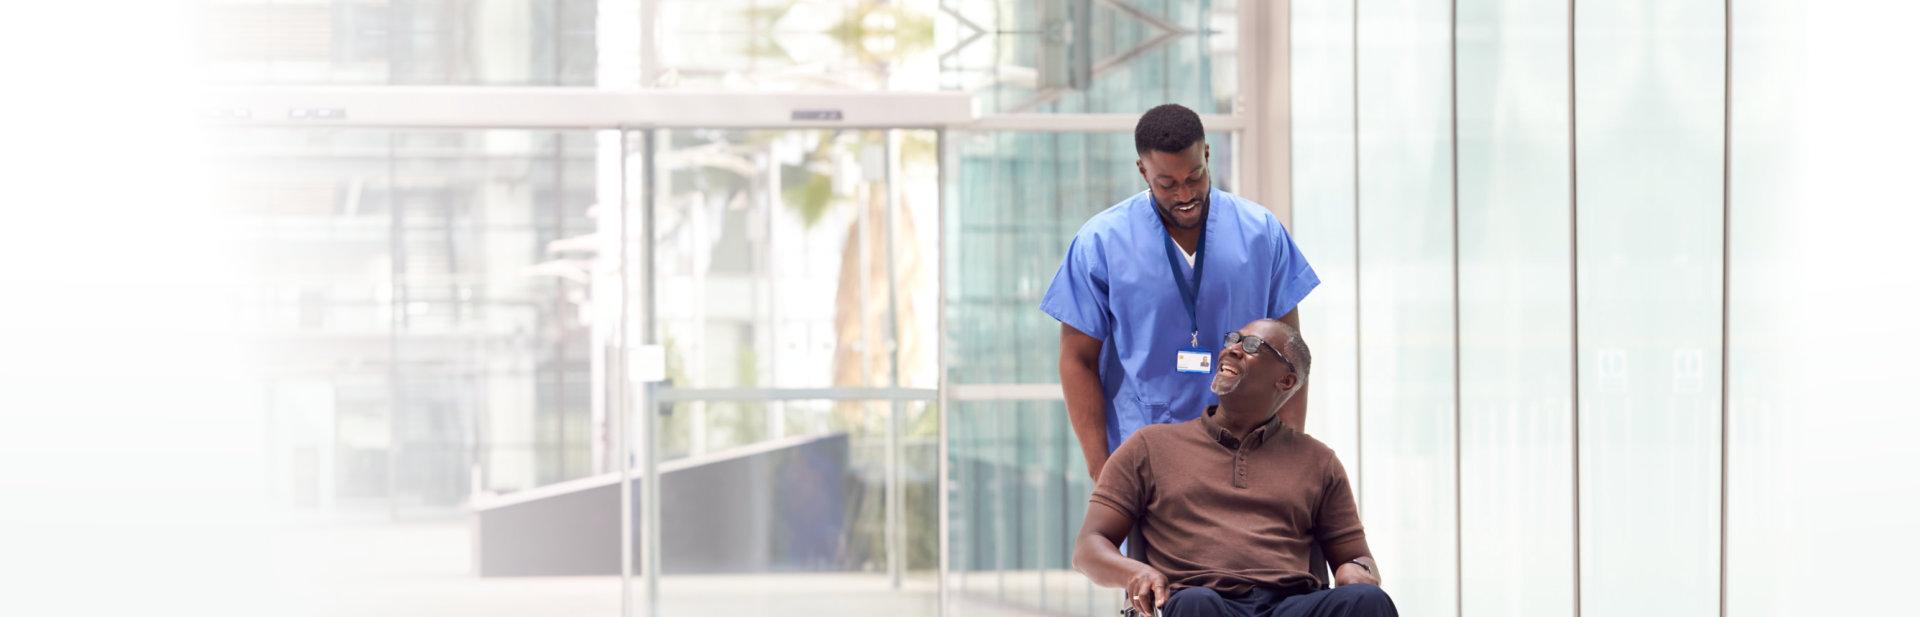 male caregiver assisting senior man in his wheelchair